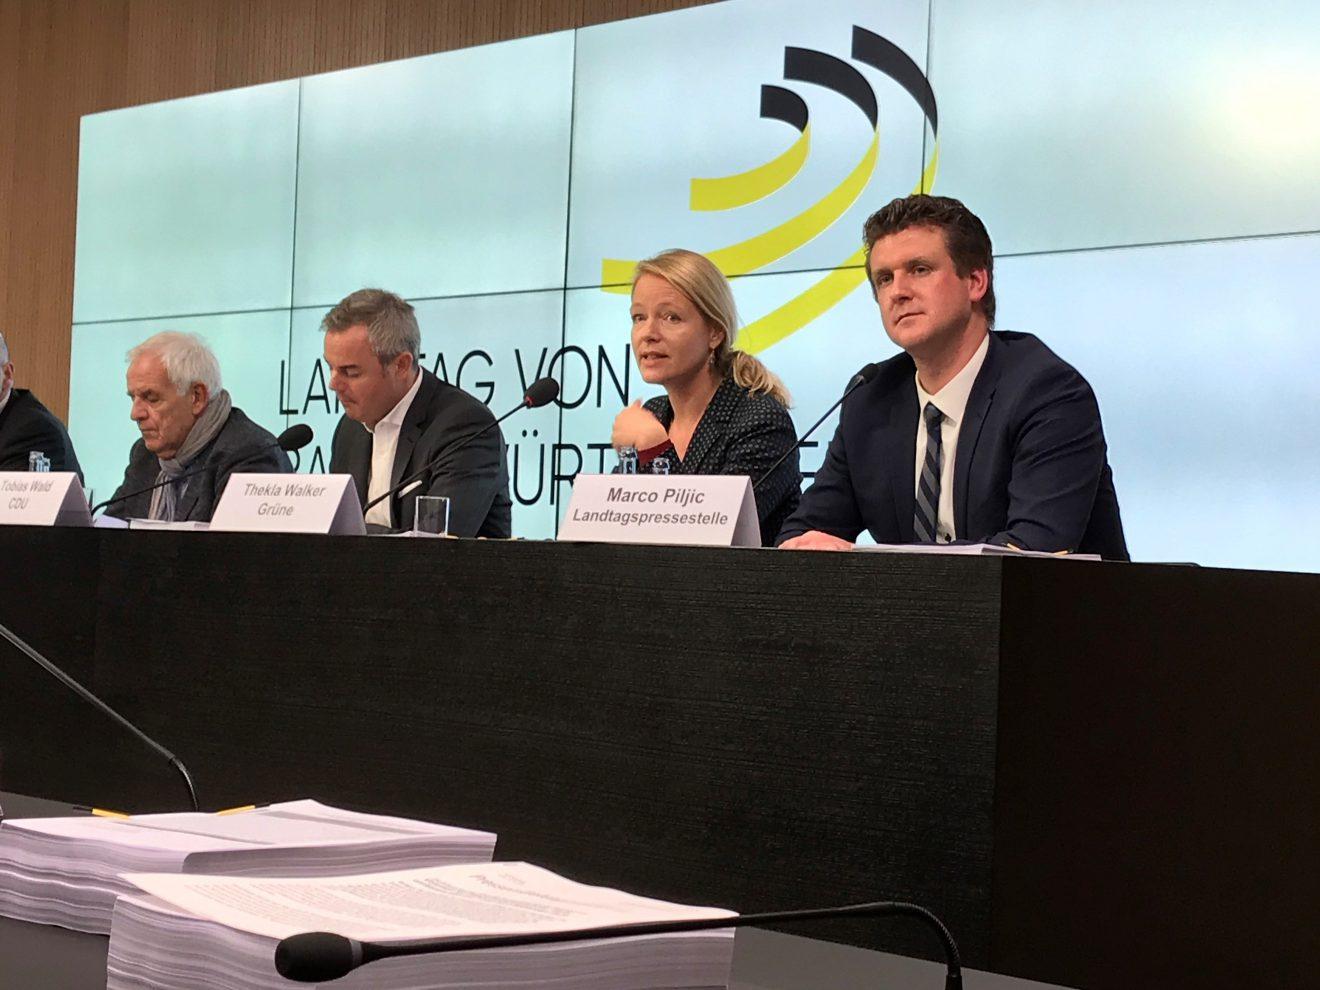 Pressekonferenz zu den Verhandlungen im Finanzausschuss